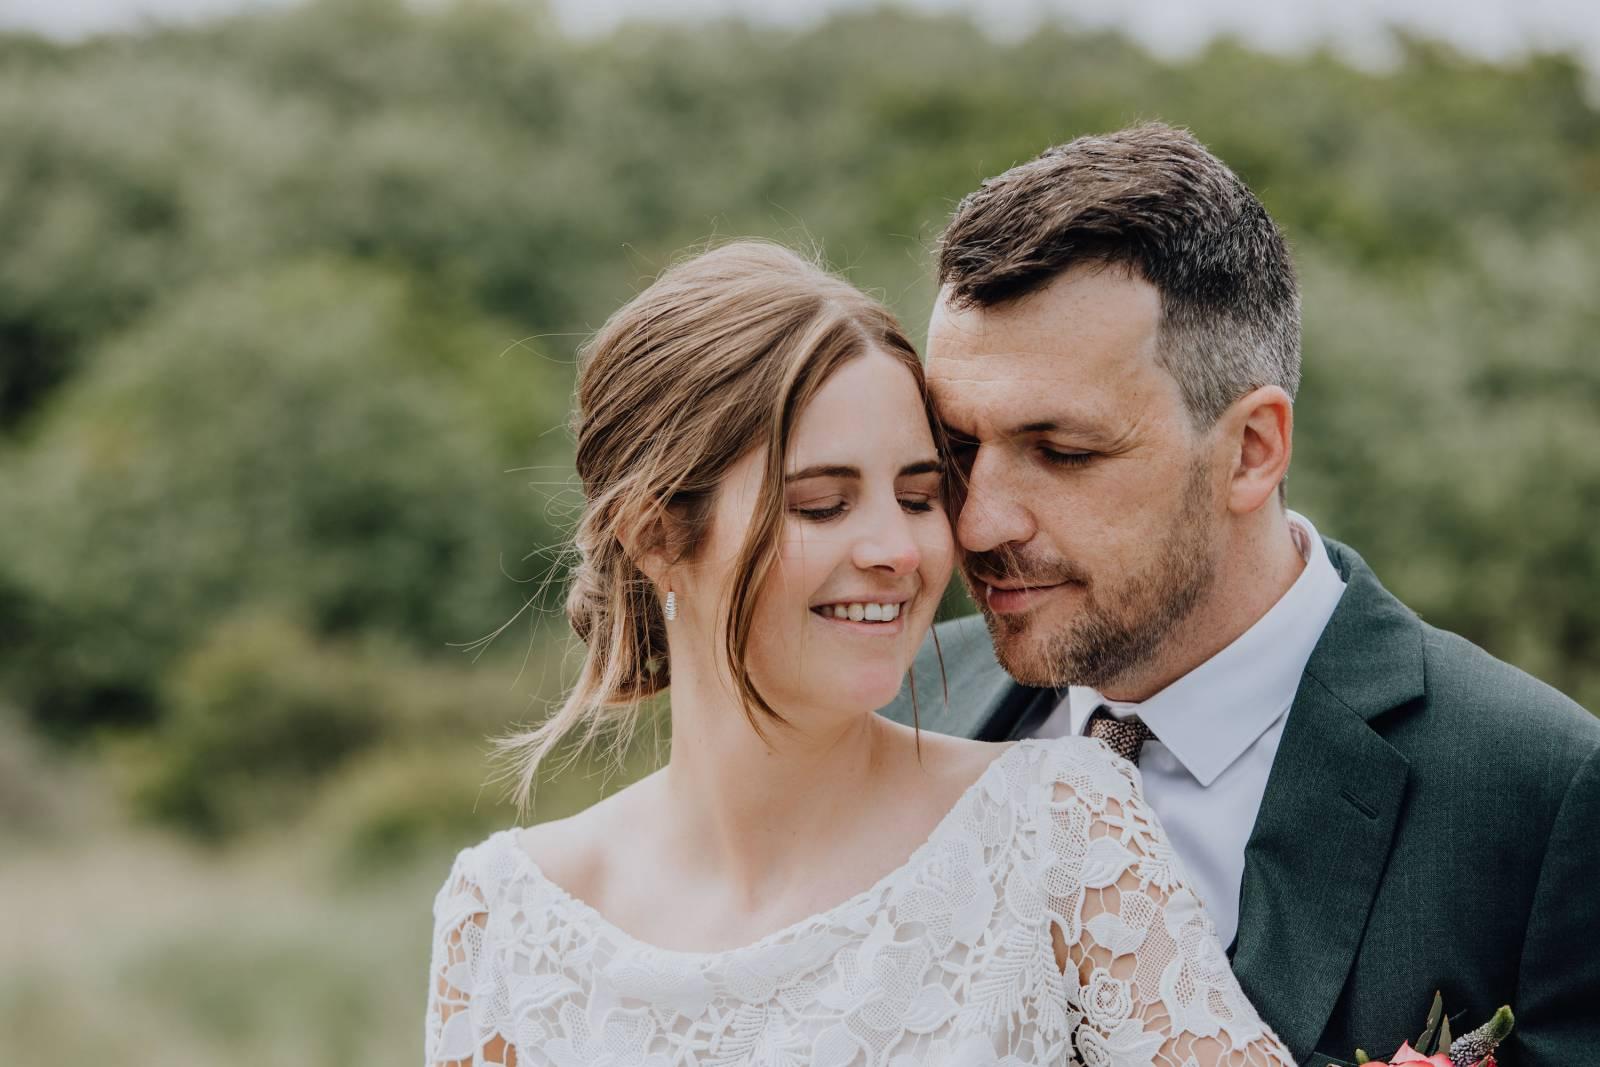 Alissia Porez - 5D4_0405 - Elise Buyse - Fotograaf Luxvisuals - House of Weddings